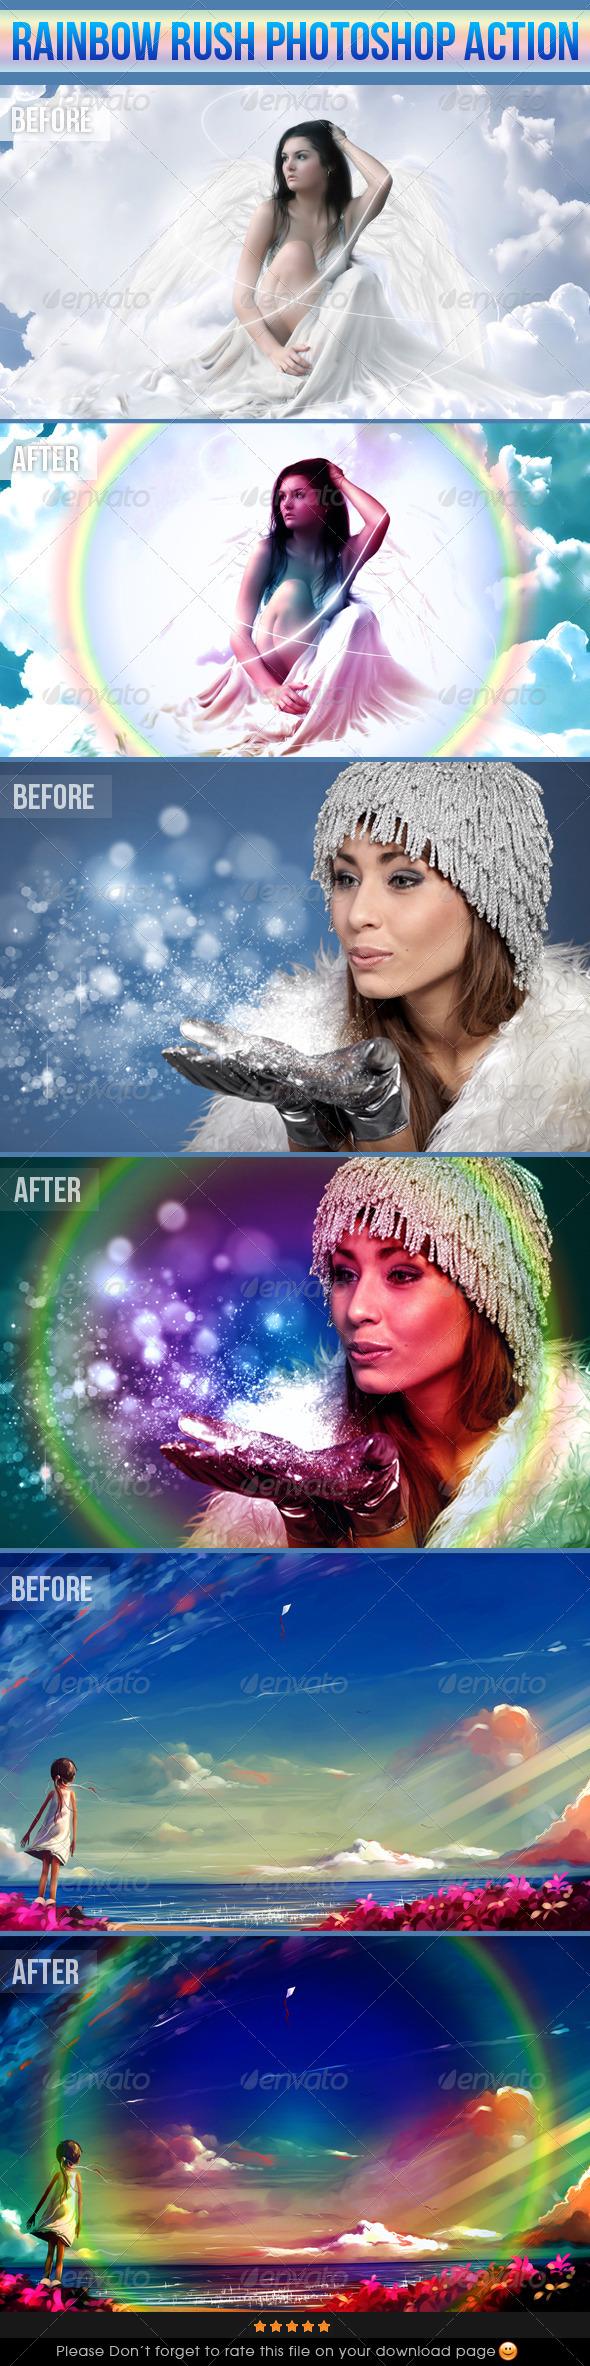 GraphicRiver Rainbow Rush Photoshop Action 4007514